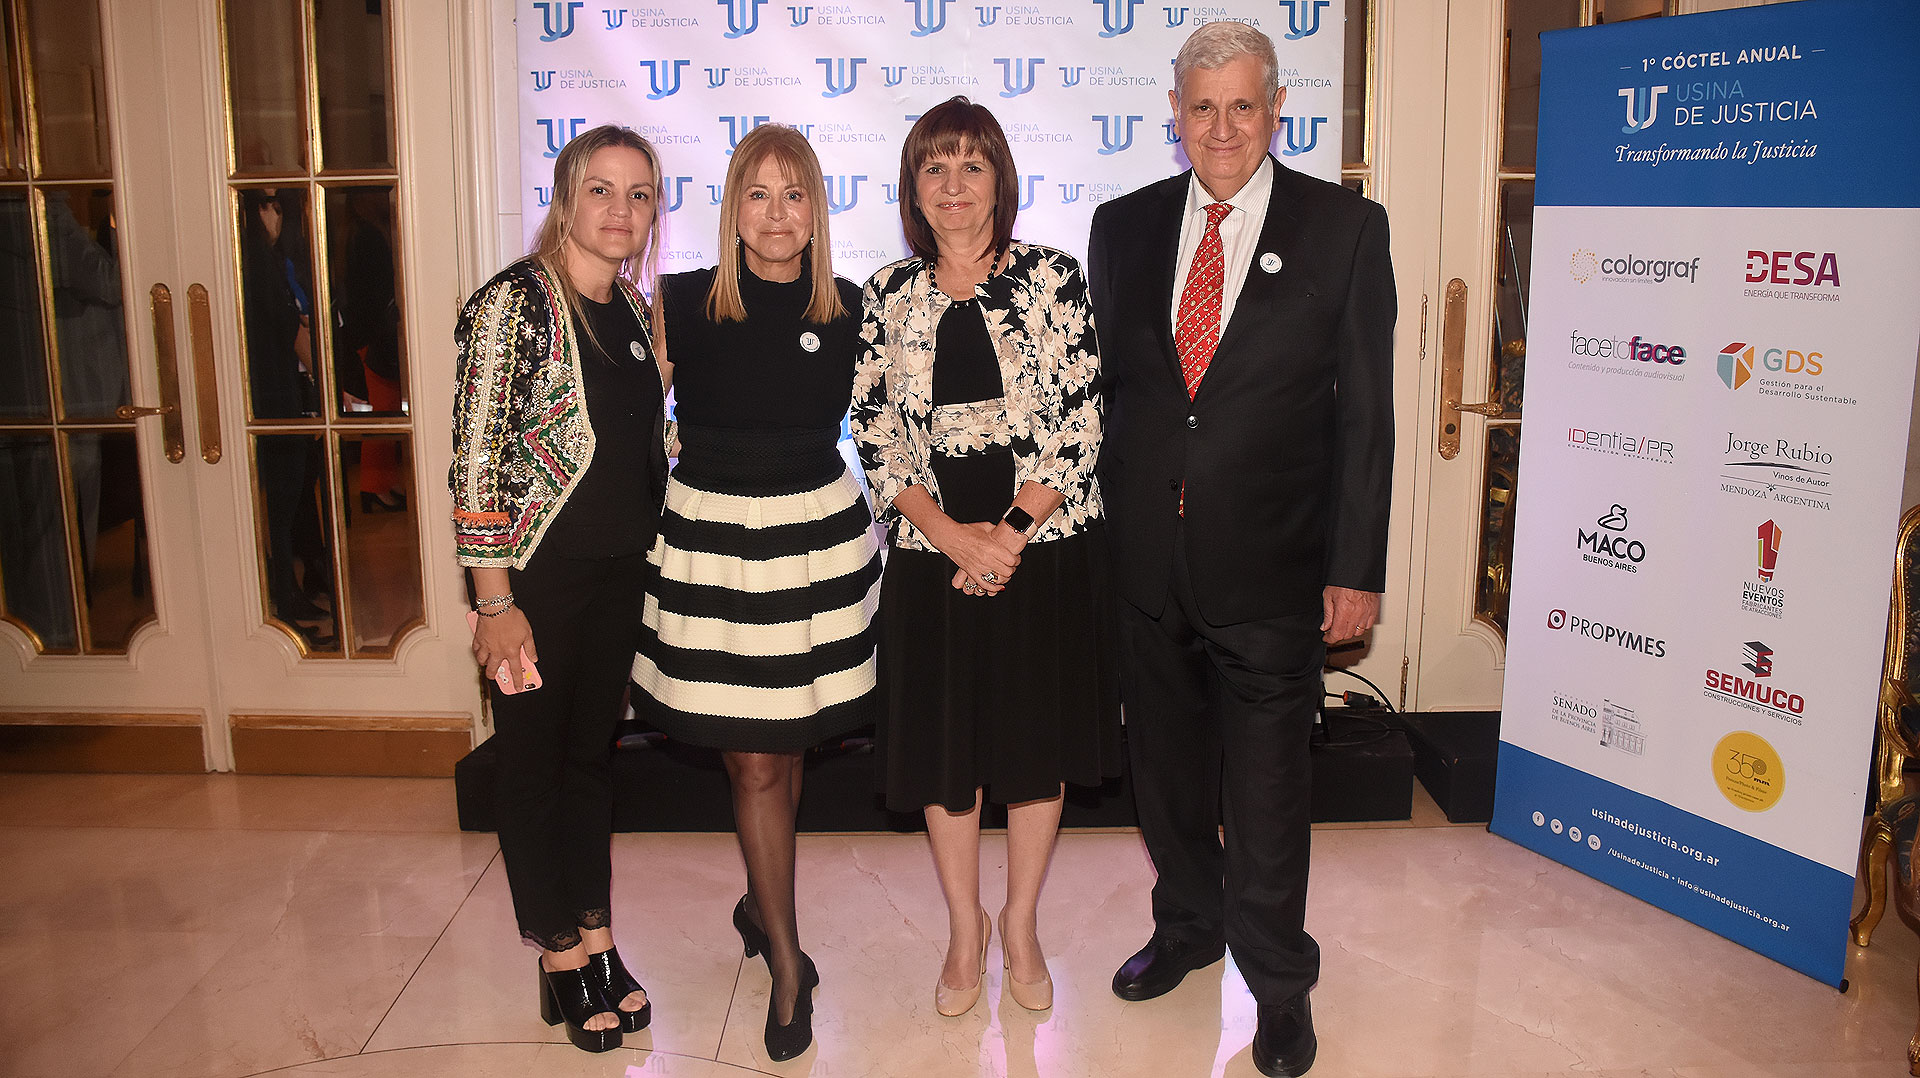 Carolina Píparo, Diana Cohen Agrest, Patricia Bullrich y Guillermo Bargna